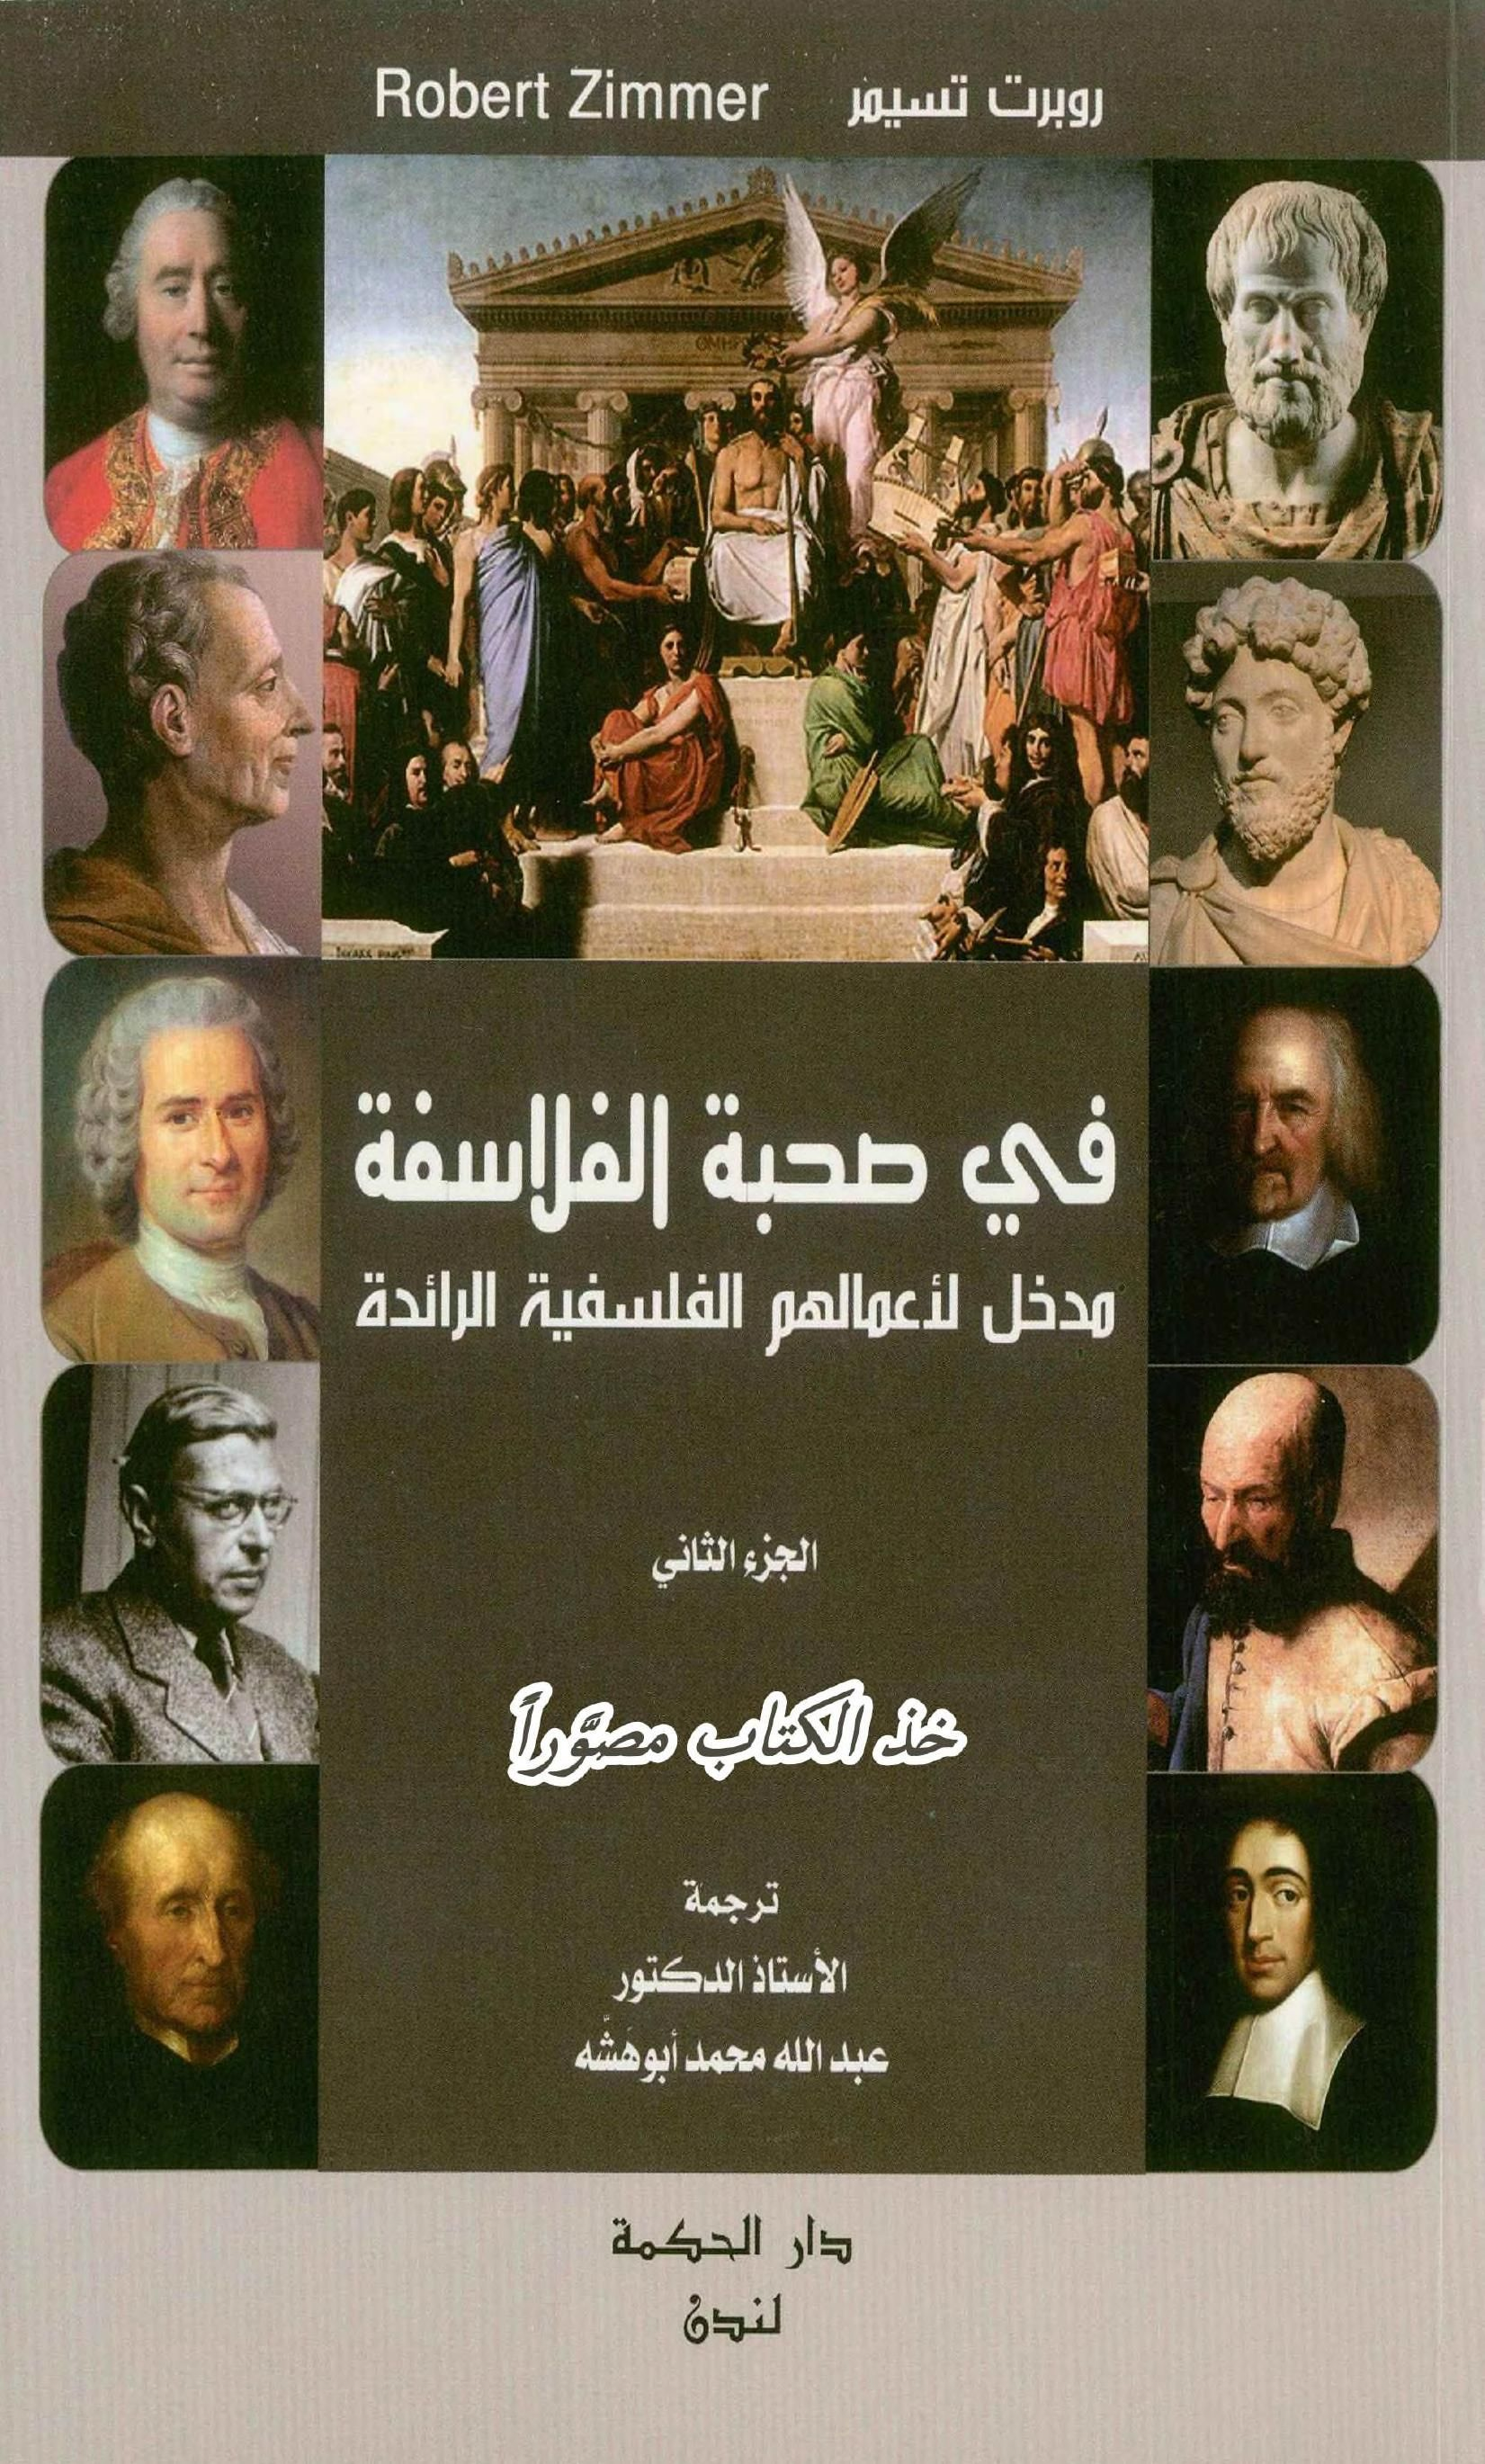 في صحبة الفلاسفة ج 2 Free Download Borrow And Streaming Internet Archive Arabic Books Download Books Books To Read